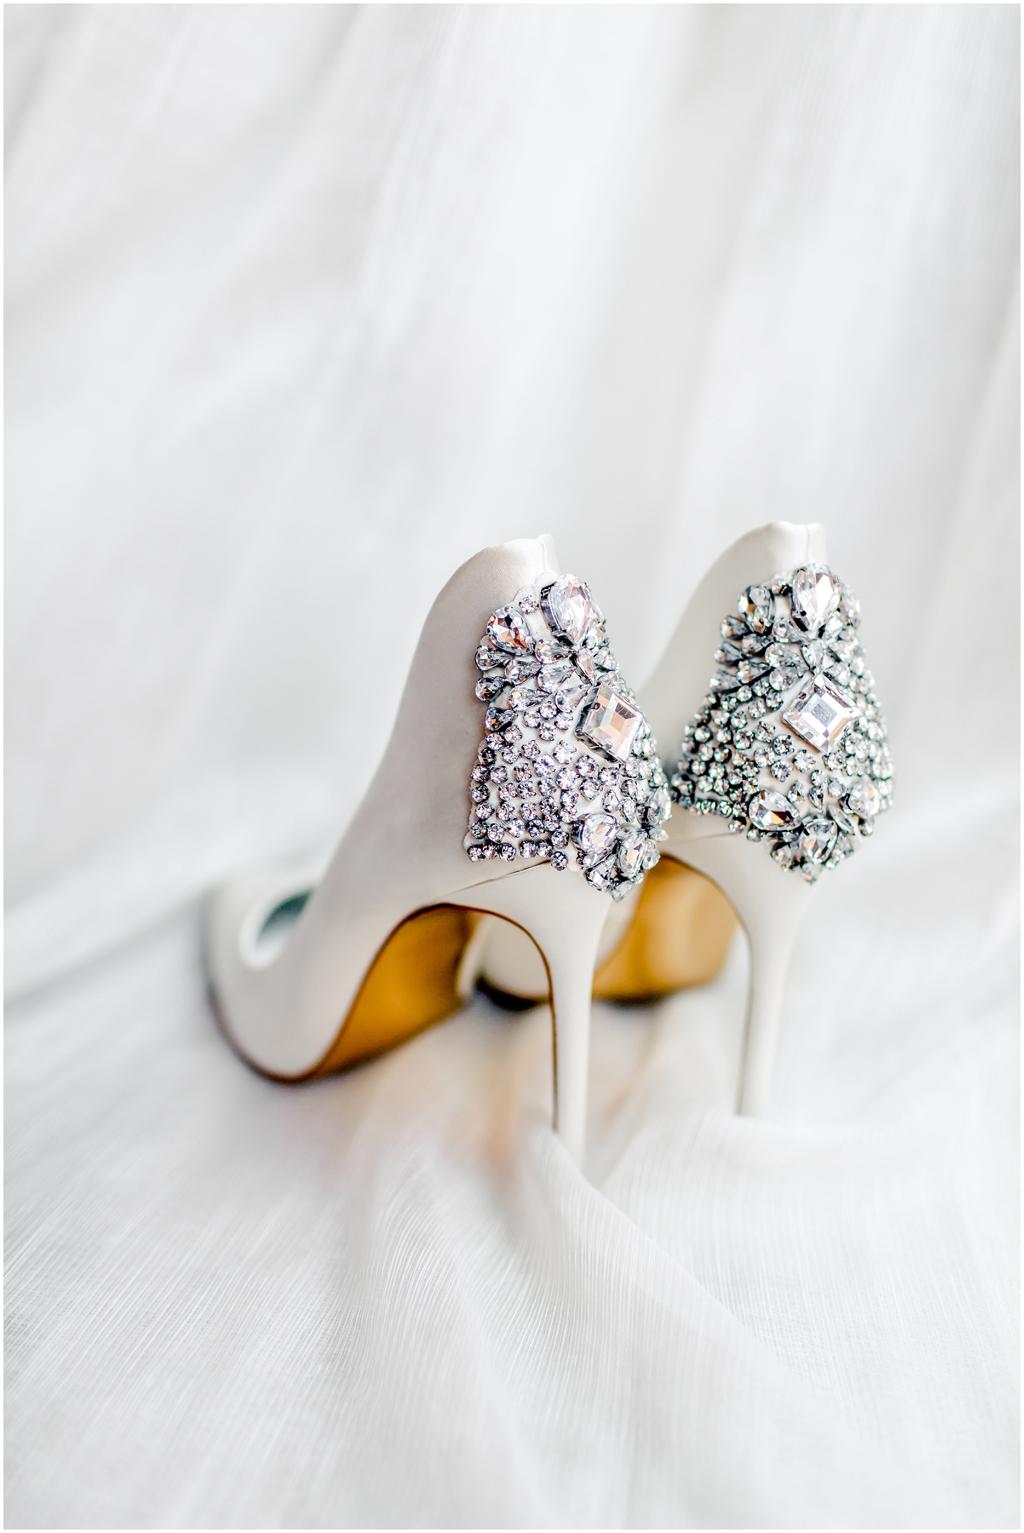 ritz-carlton-georgetown-wedding-washington-dc-photography-liz-stewart-photo-00001